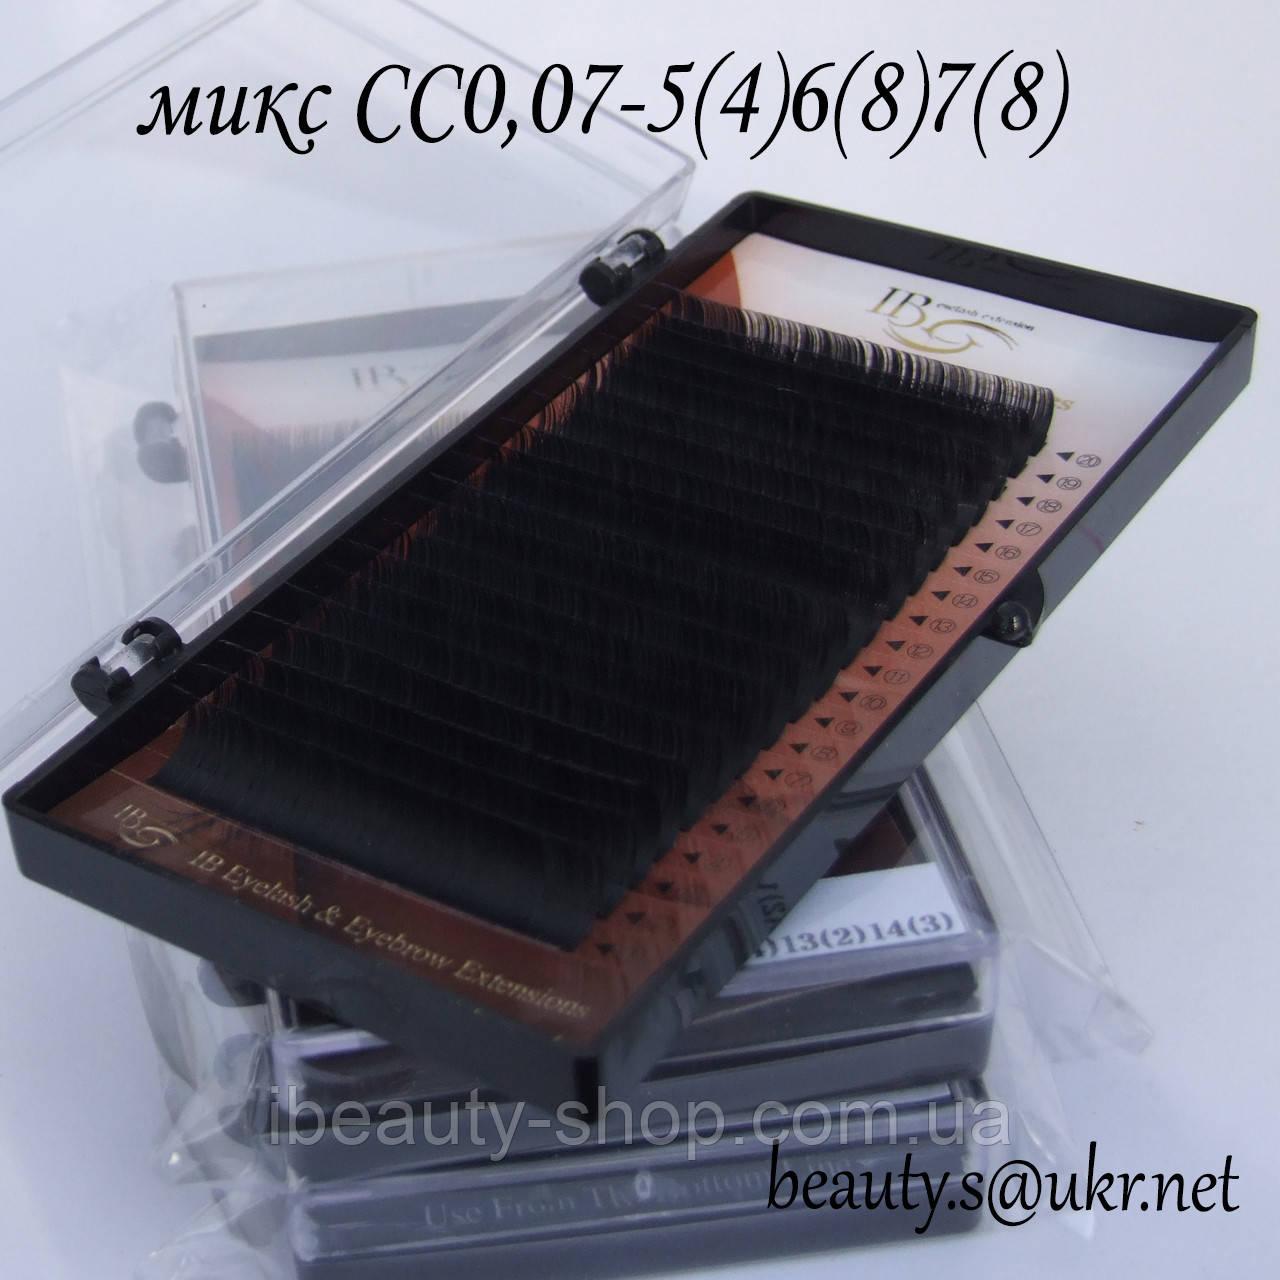 Вії I-Beauty мікс СС-0,07 5-6-7мм